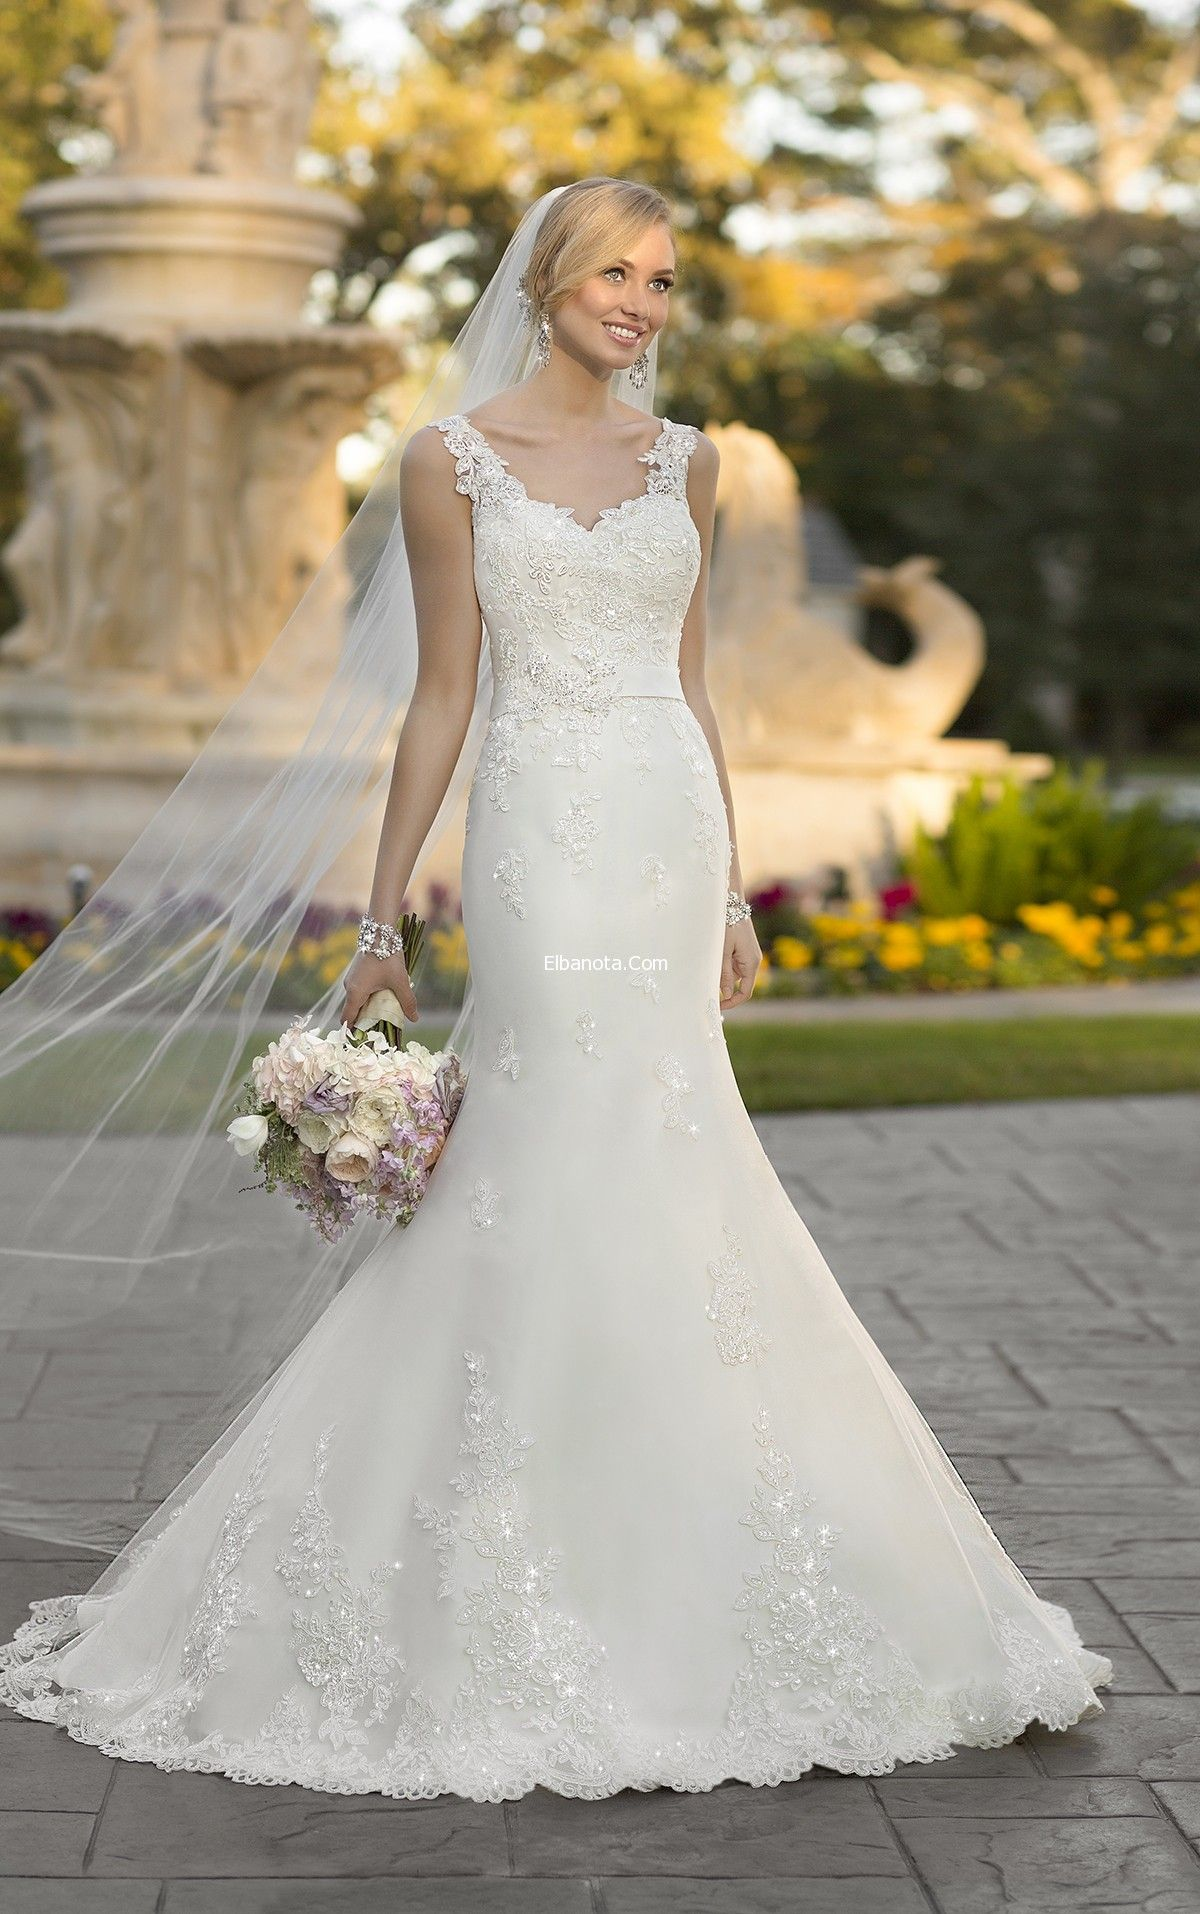 فساتين زفاف دانتيل 2015 مجموعة فساتين زفاف 2015 اثواب الزفاف دانتيل 2015 فساتين زفاف أزياء ب York Wedding Dress Stella York Wedding Dress Wedding Dresses